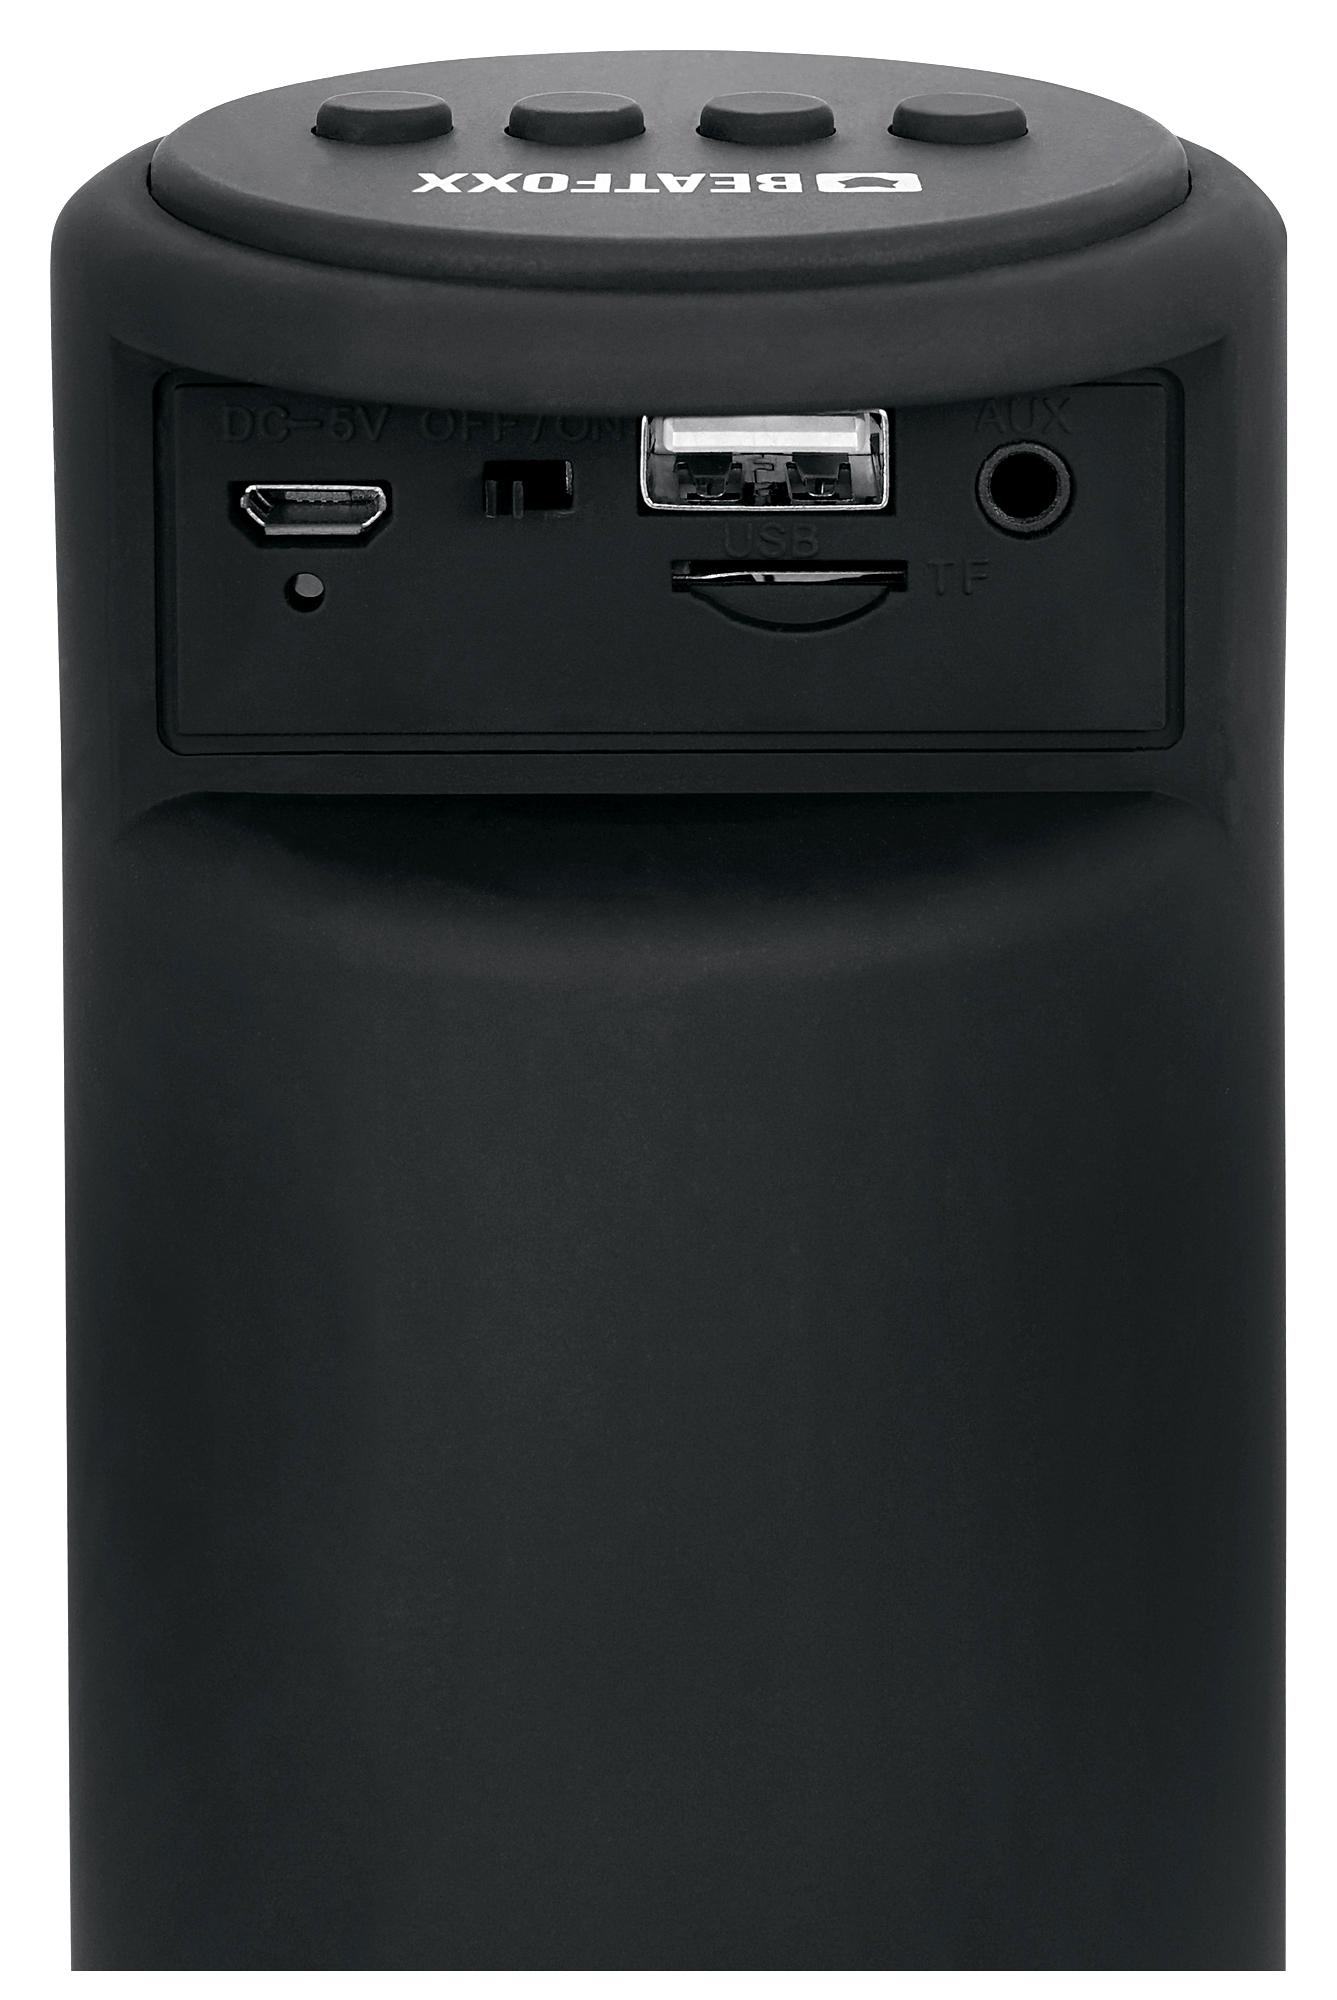 beatfoxx ledbeat pro portabler led bluetooth lautsprecher. Black Bedroom Furniture Sets. Home Design Ideas